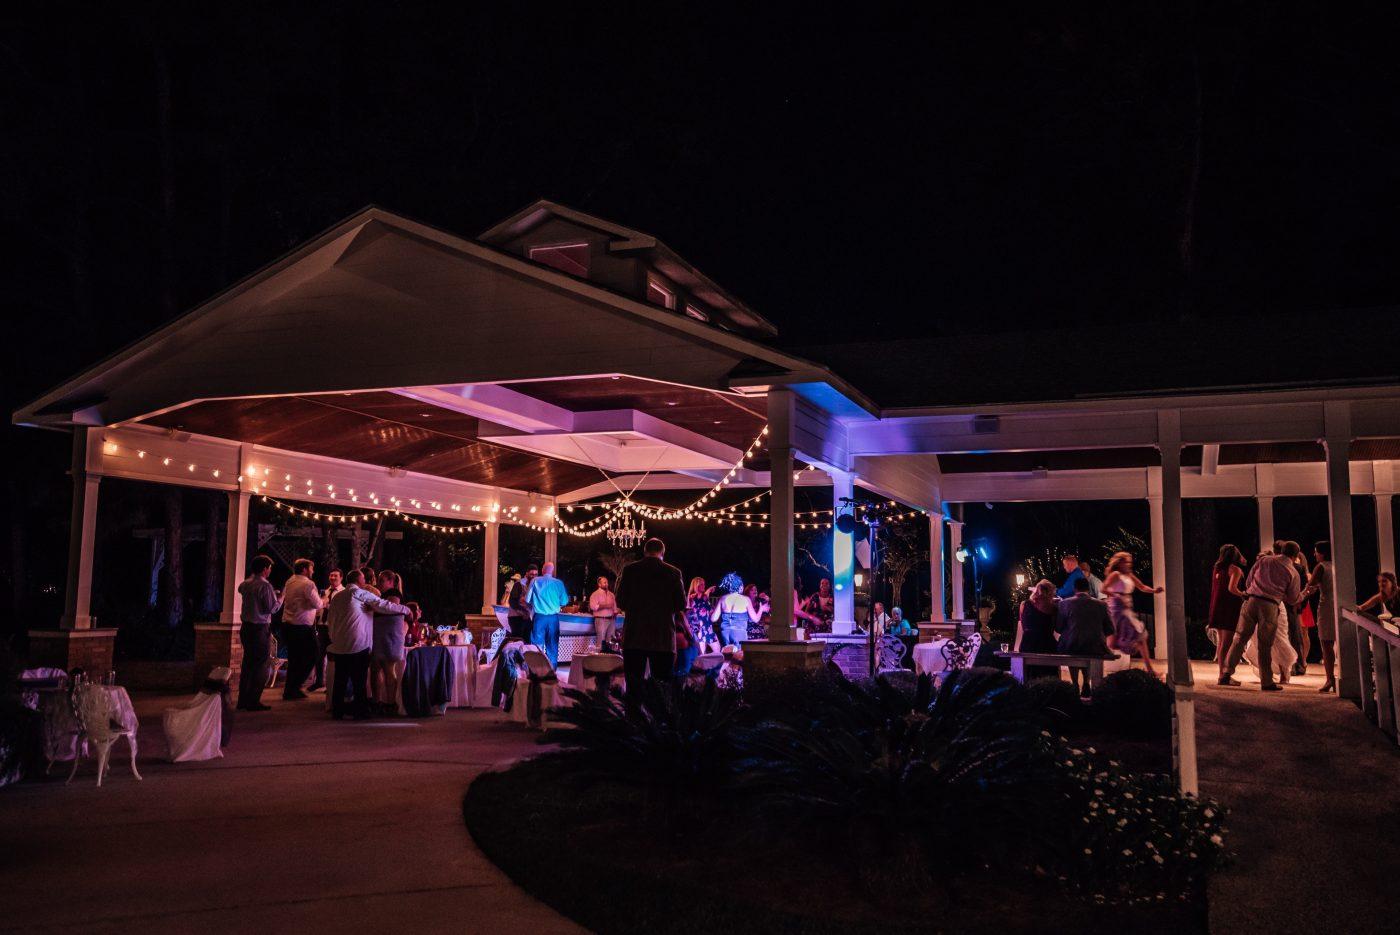 Pavilion during reception